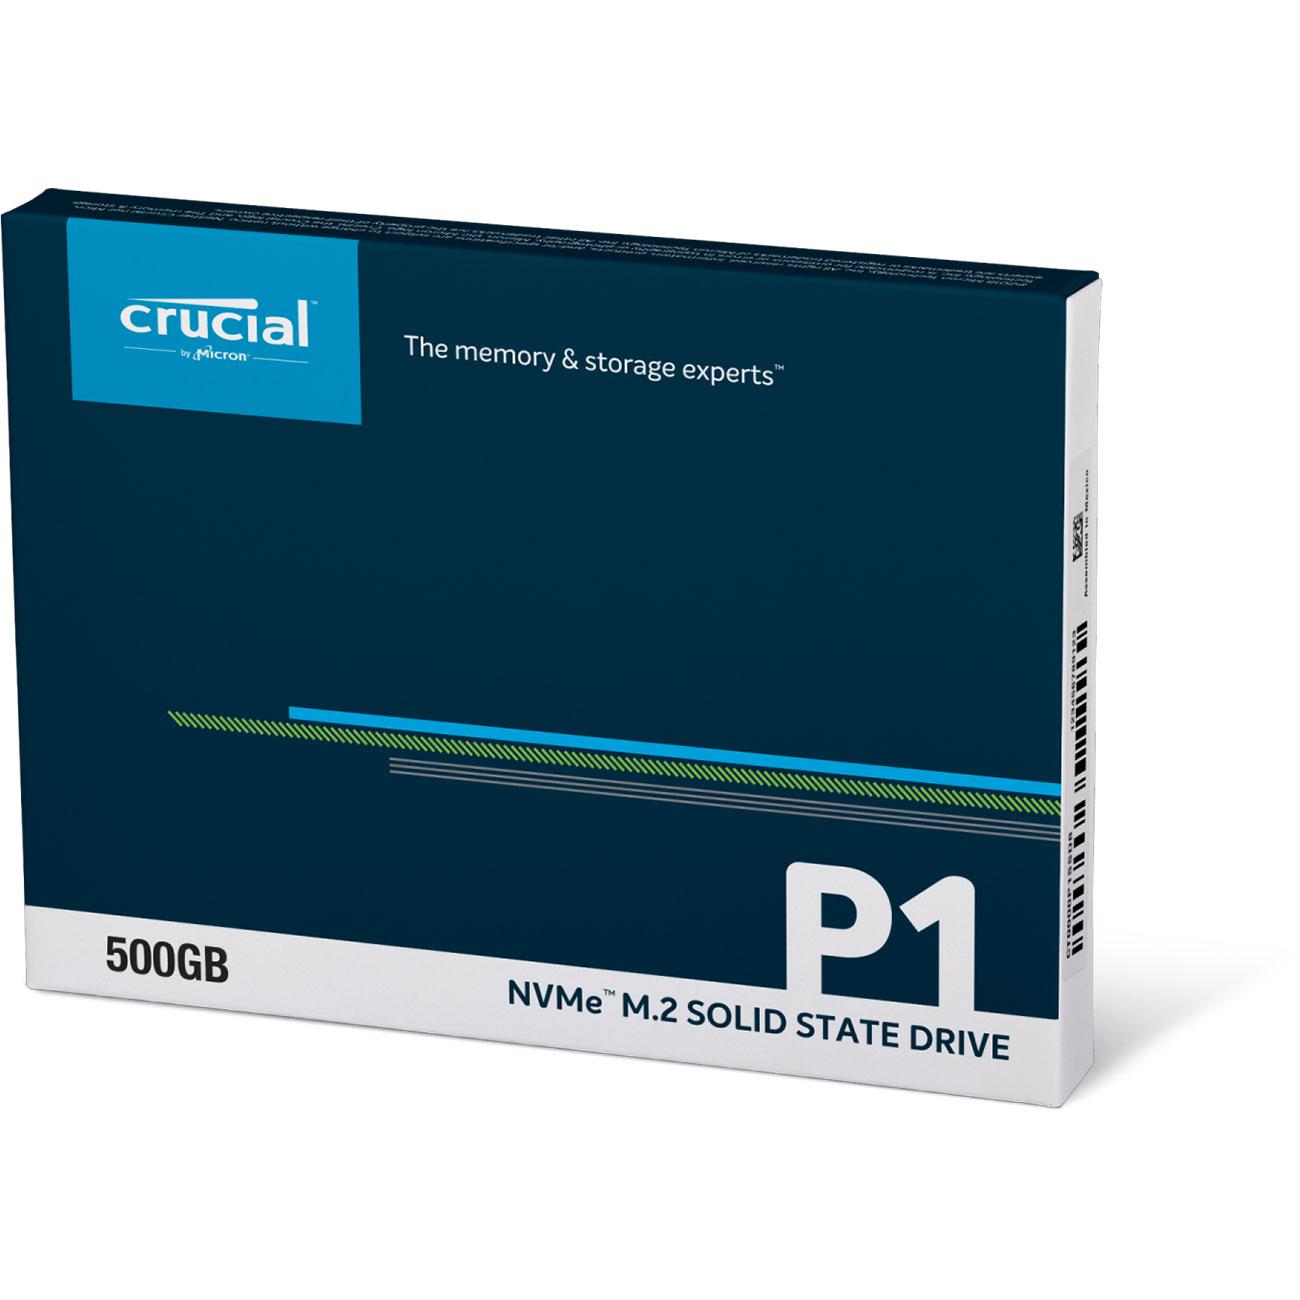 Crucial P1 480-525Go - Disque SSD Crucial - Cybertek.fr - 1